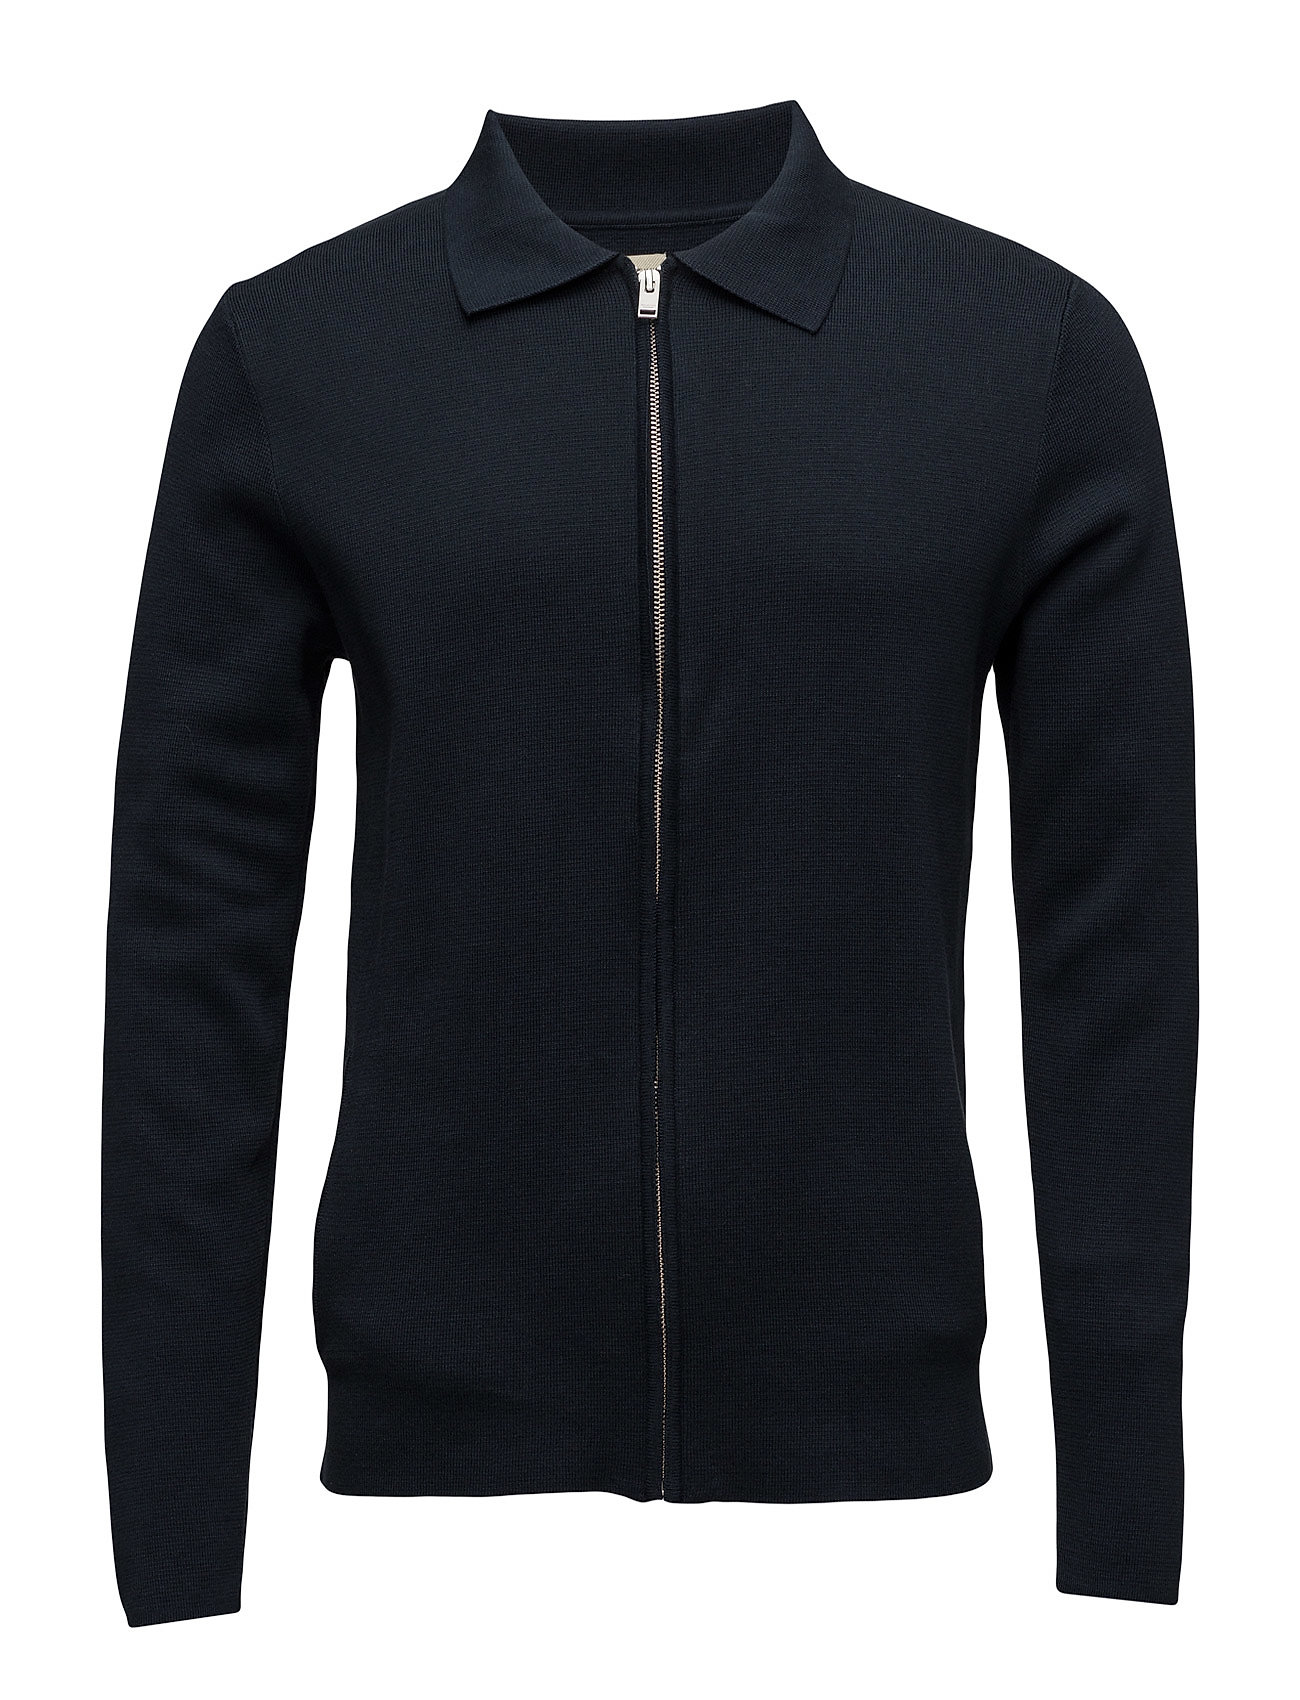 Shhjakob Knitted Jacket Selected Homme Cardigans til Herrer i Mørk Sapphire